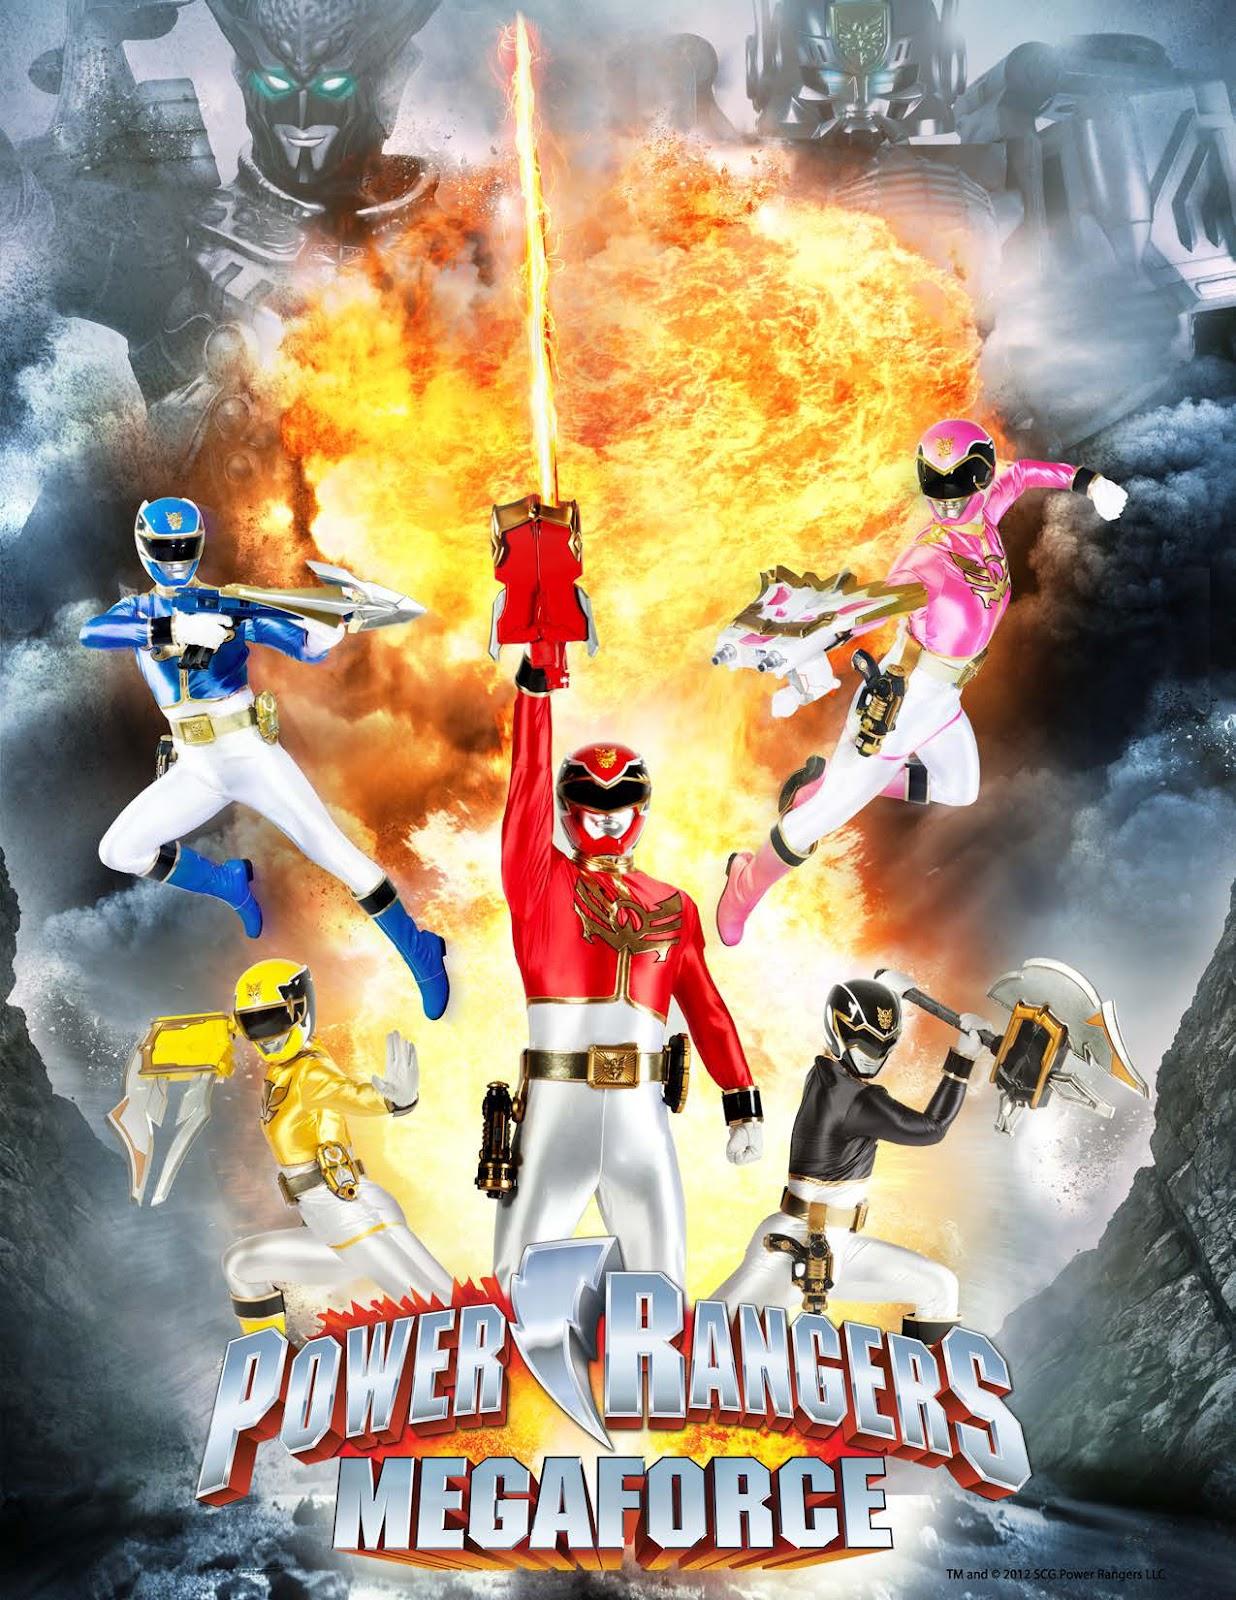 idle hands toy fair 2013 power rangers megaforce